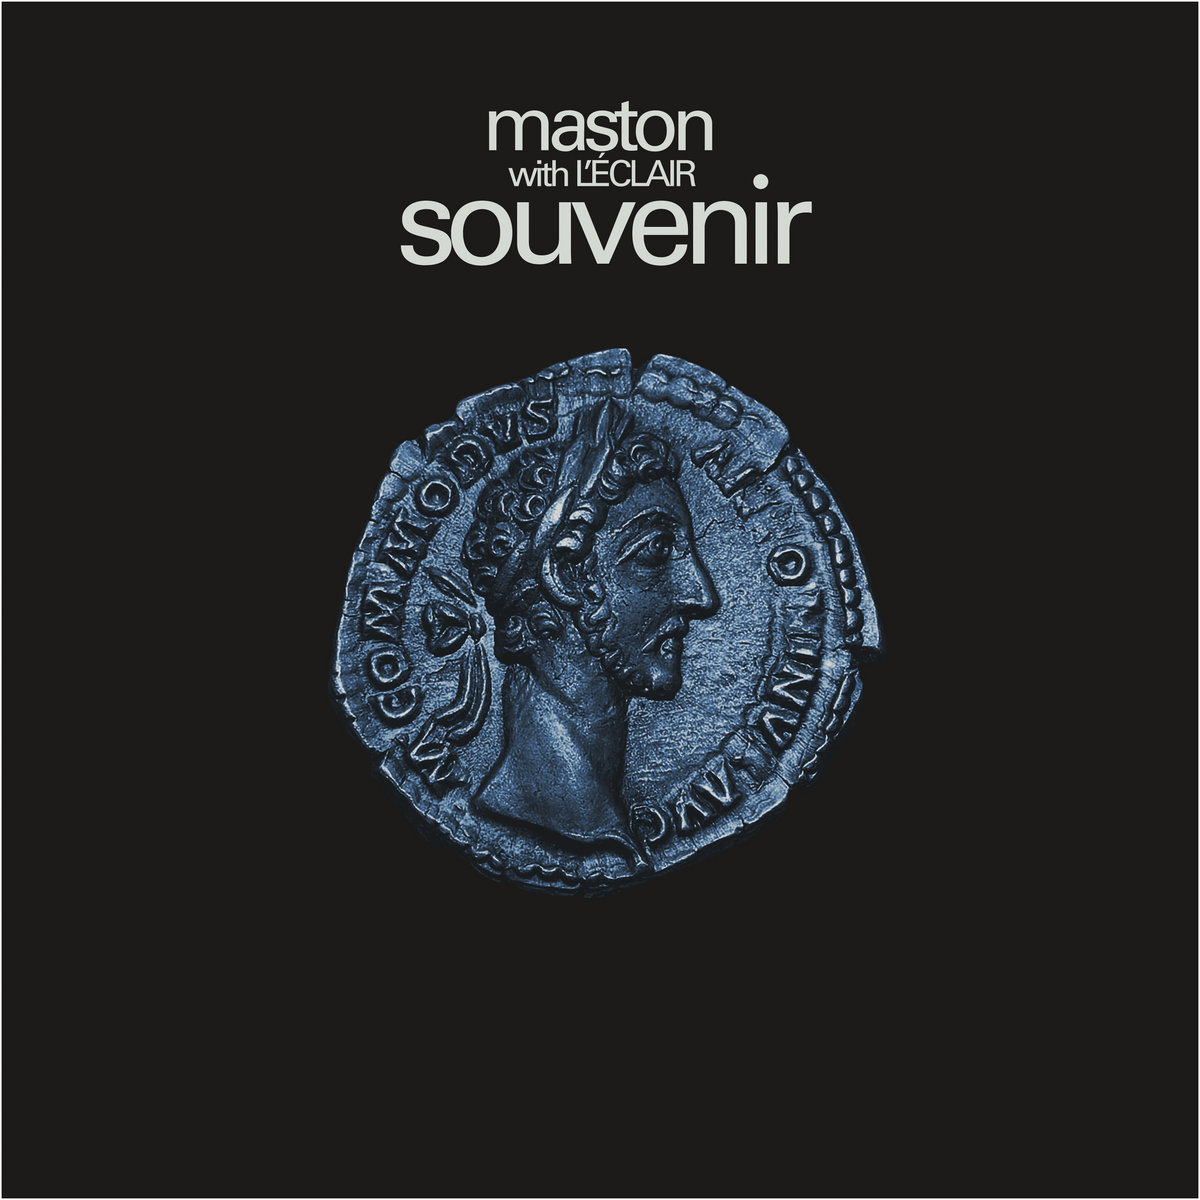 Maston with L'Eclair - Souvenir